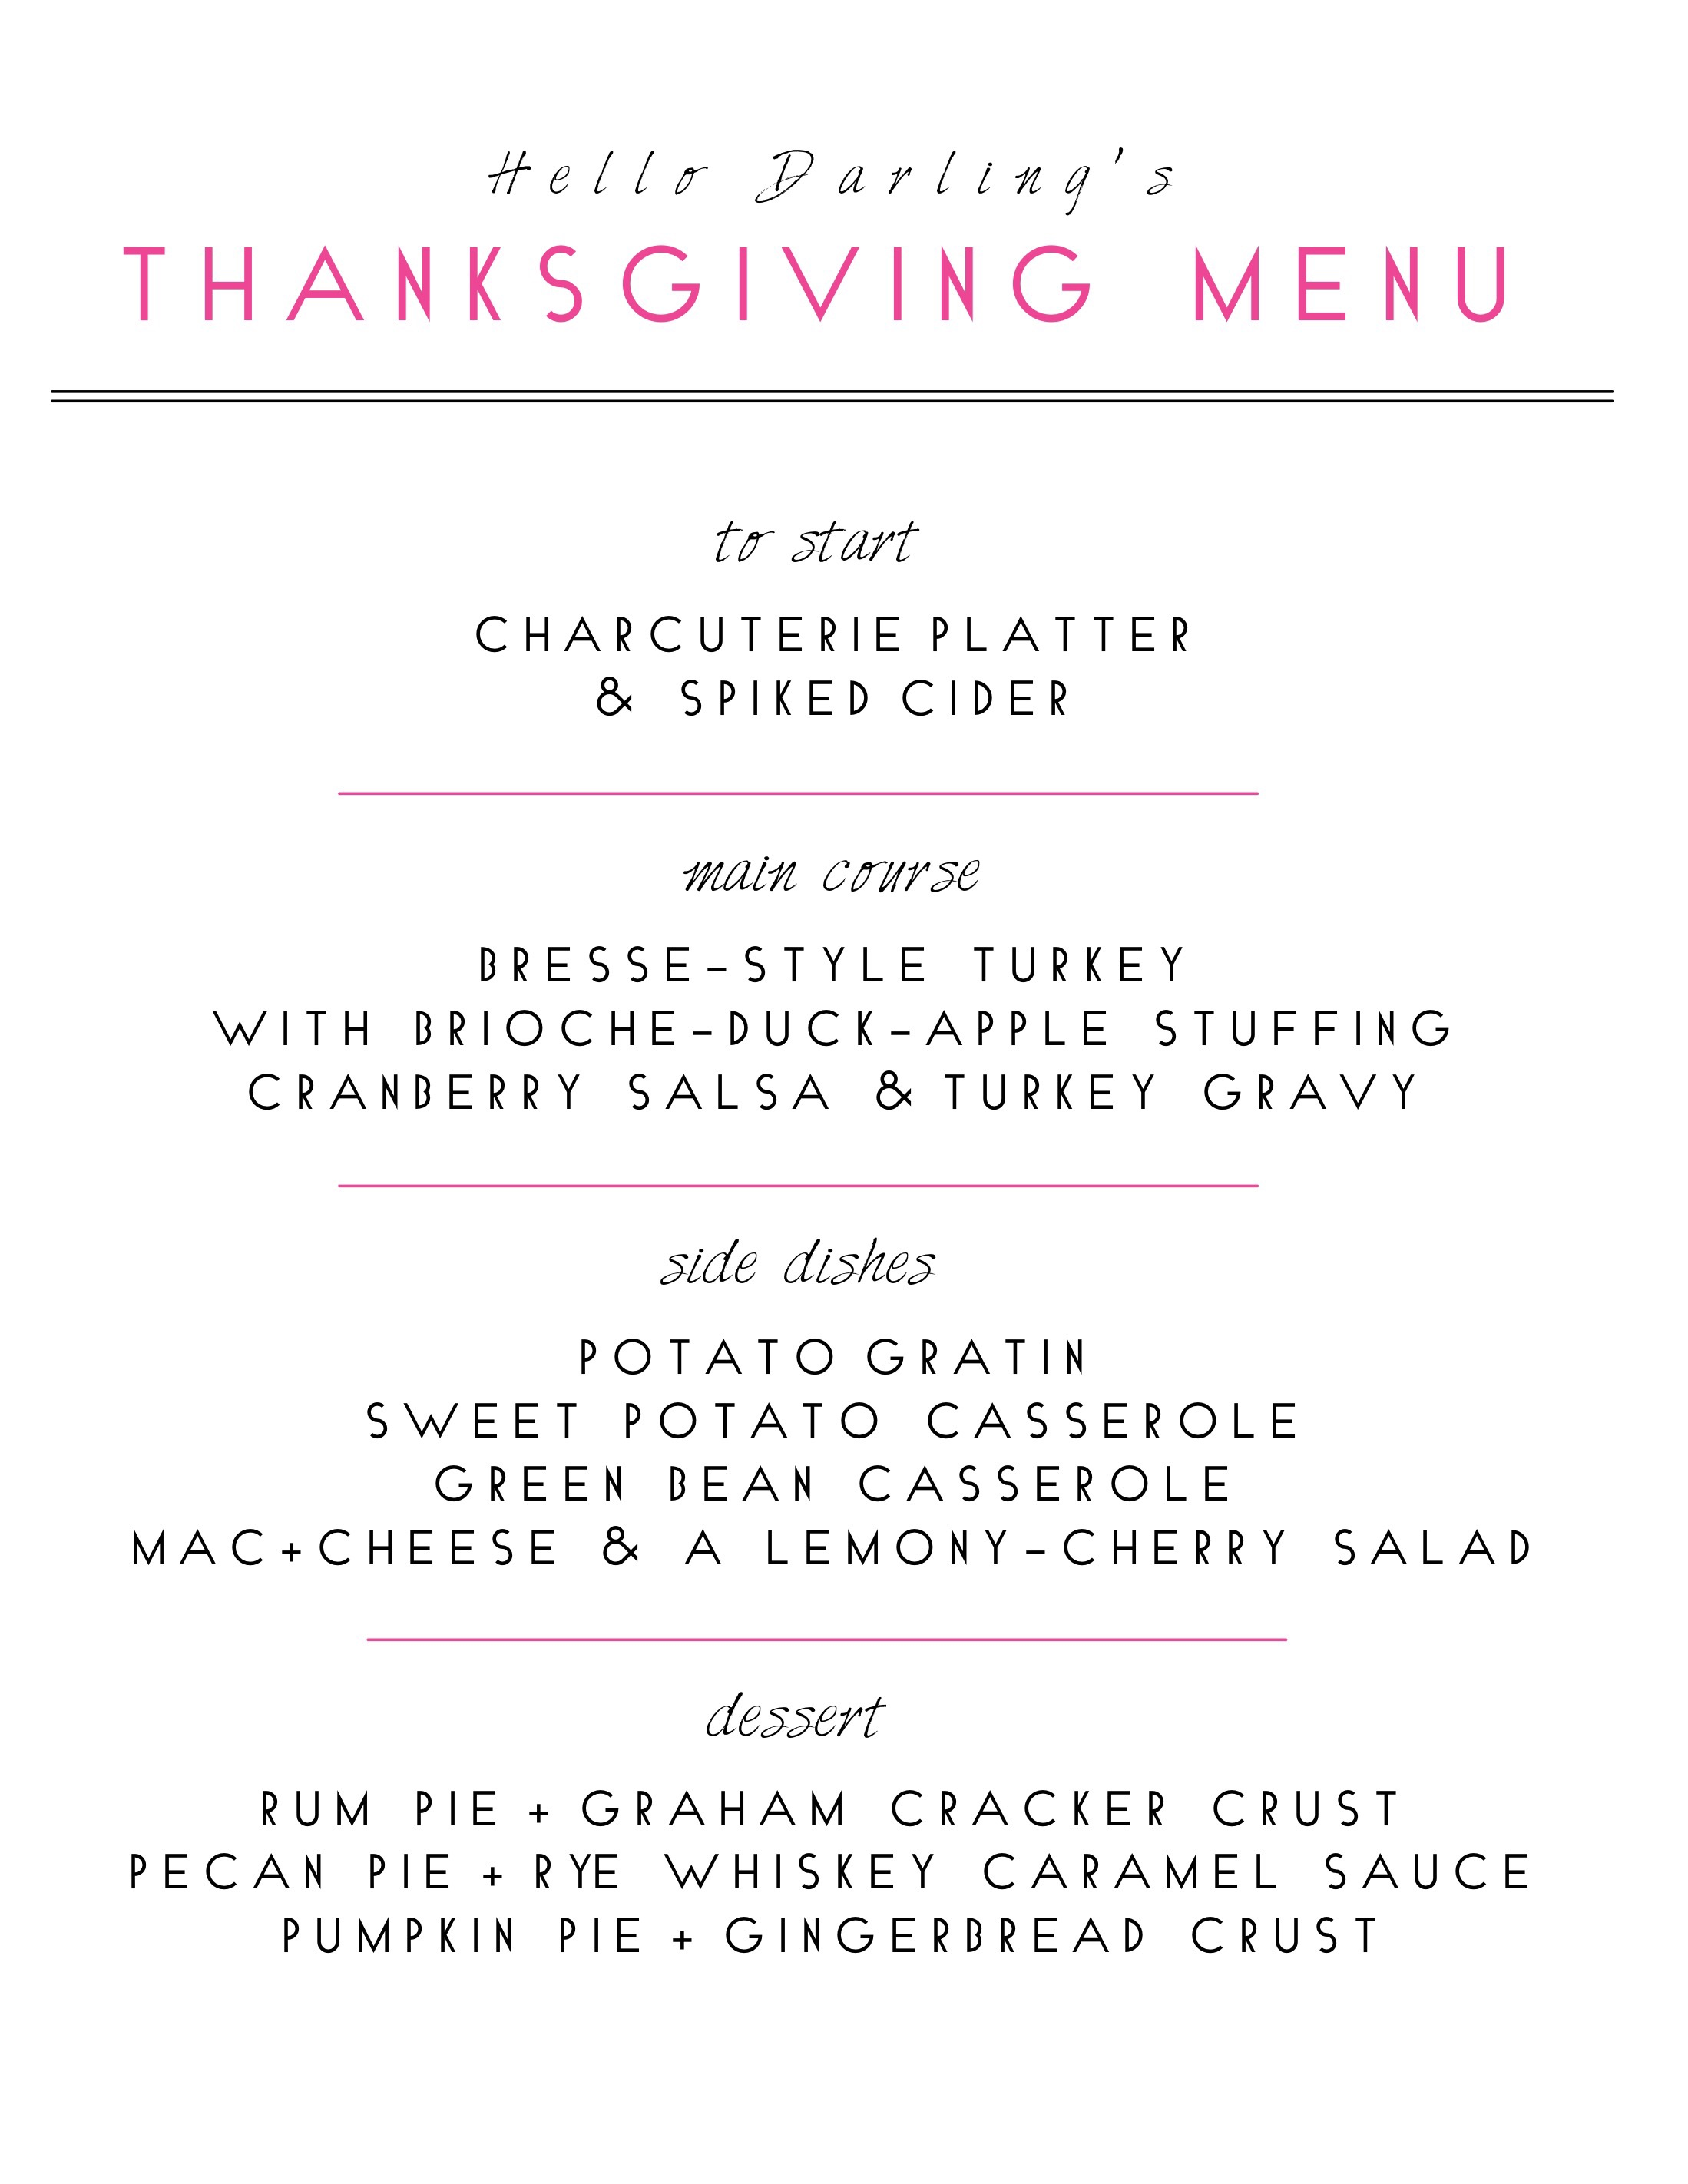 R E C I P E S :  Bresse-Style Turkey  |  Brioche Stuffing  |  Potato Gratin  |  Sweet Potato Casserole  |  Green Bean Casserole  |  Lemony-Cherry Salad  |  Rum Pie  |  Pecan Pie  |  Pumpkin Pie  .